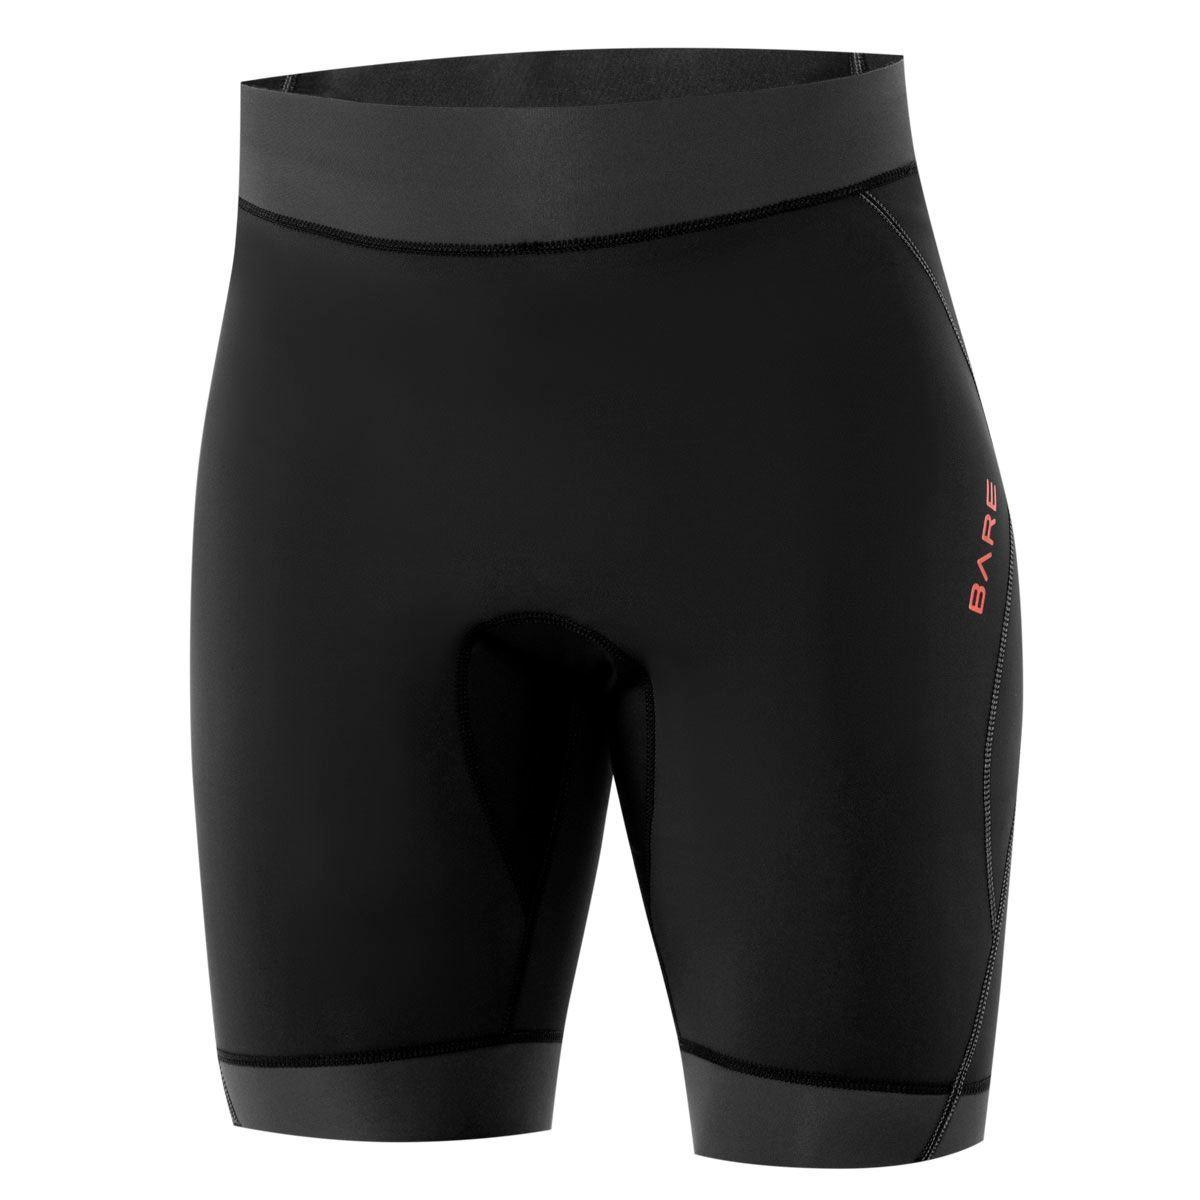 ExoWear Shorts - Herre thumbnail